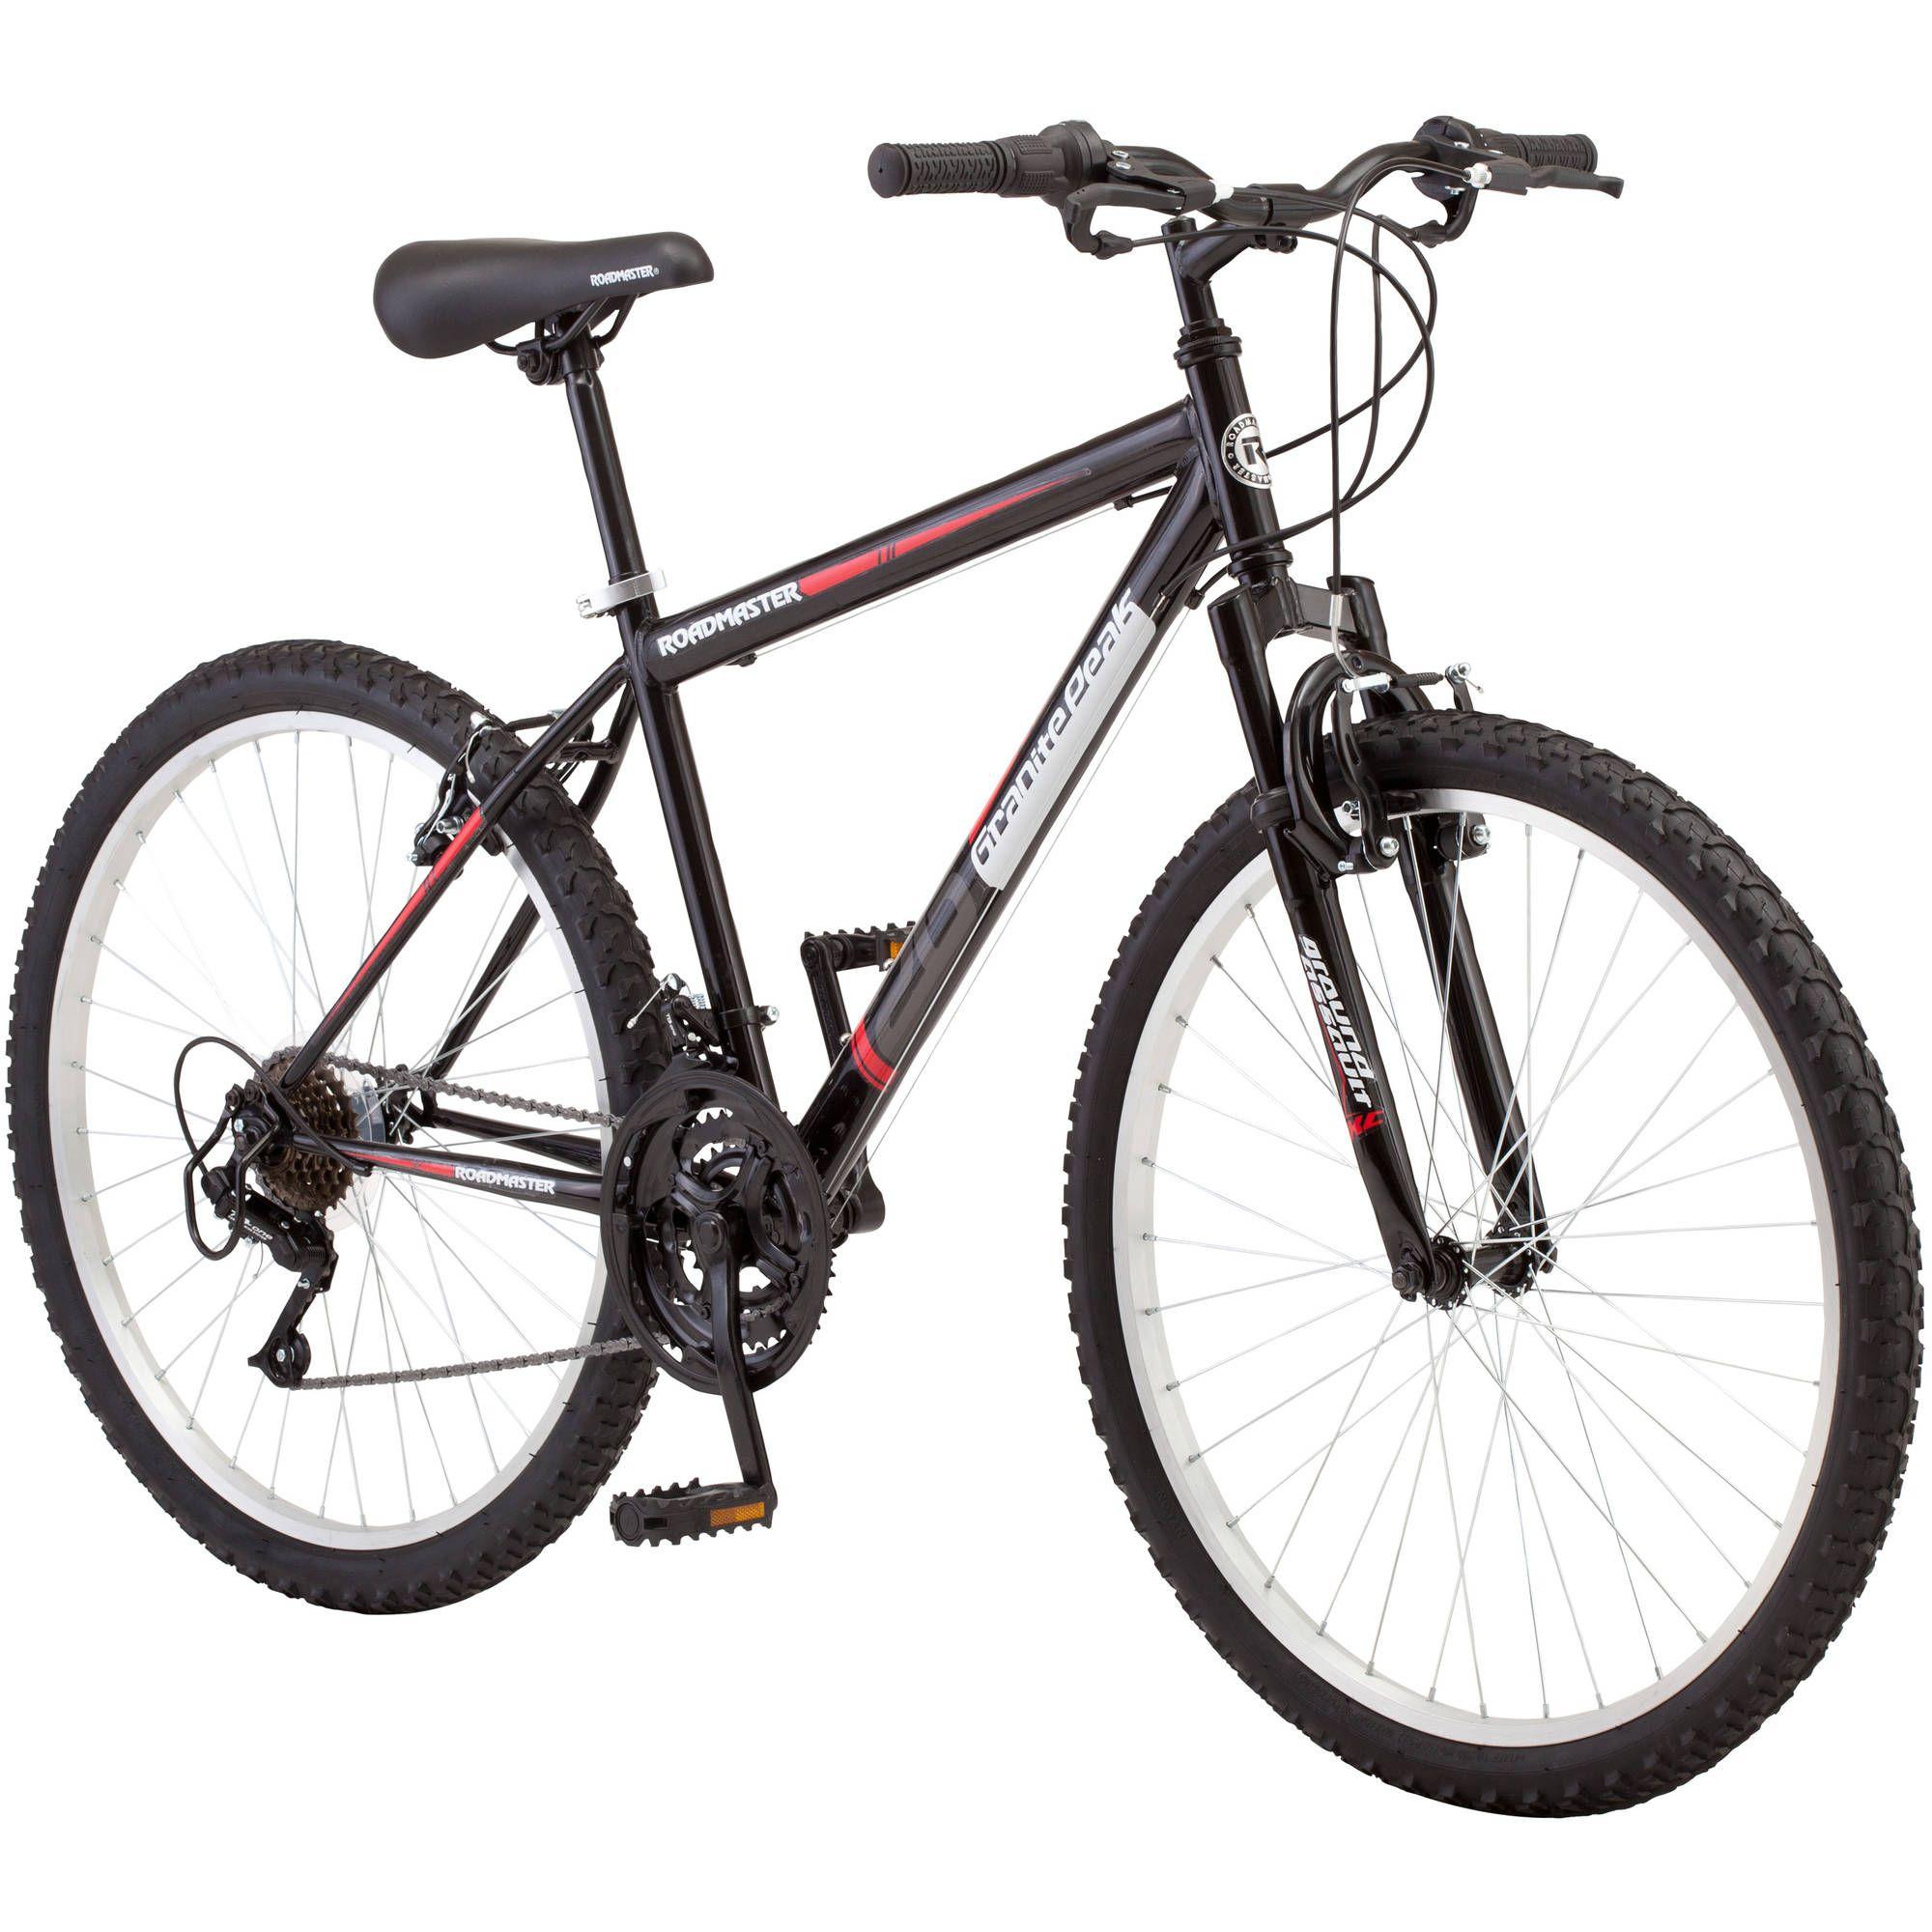 26 Inch Roadmaster Granite Peak Mens Bike For 80 Http Sylsdeals